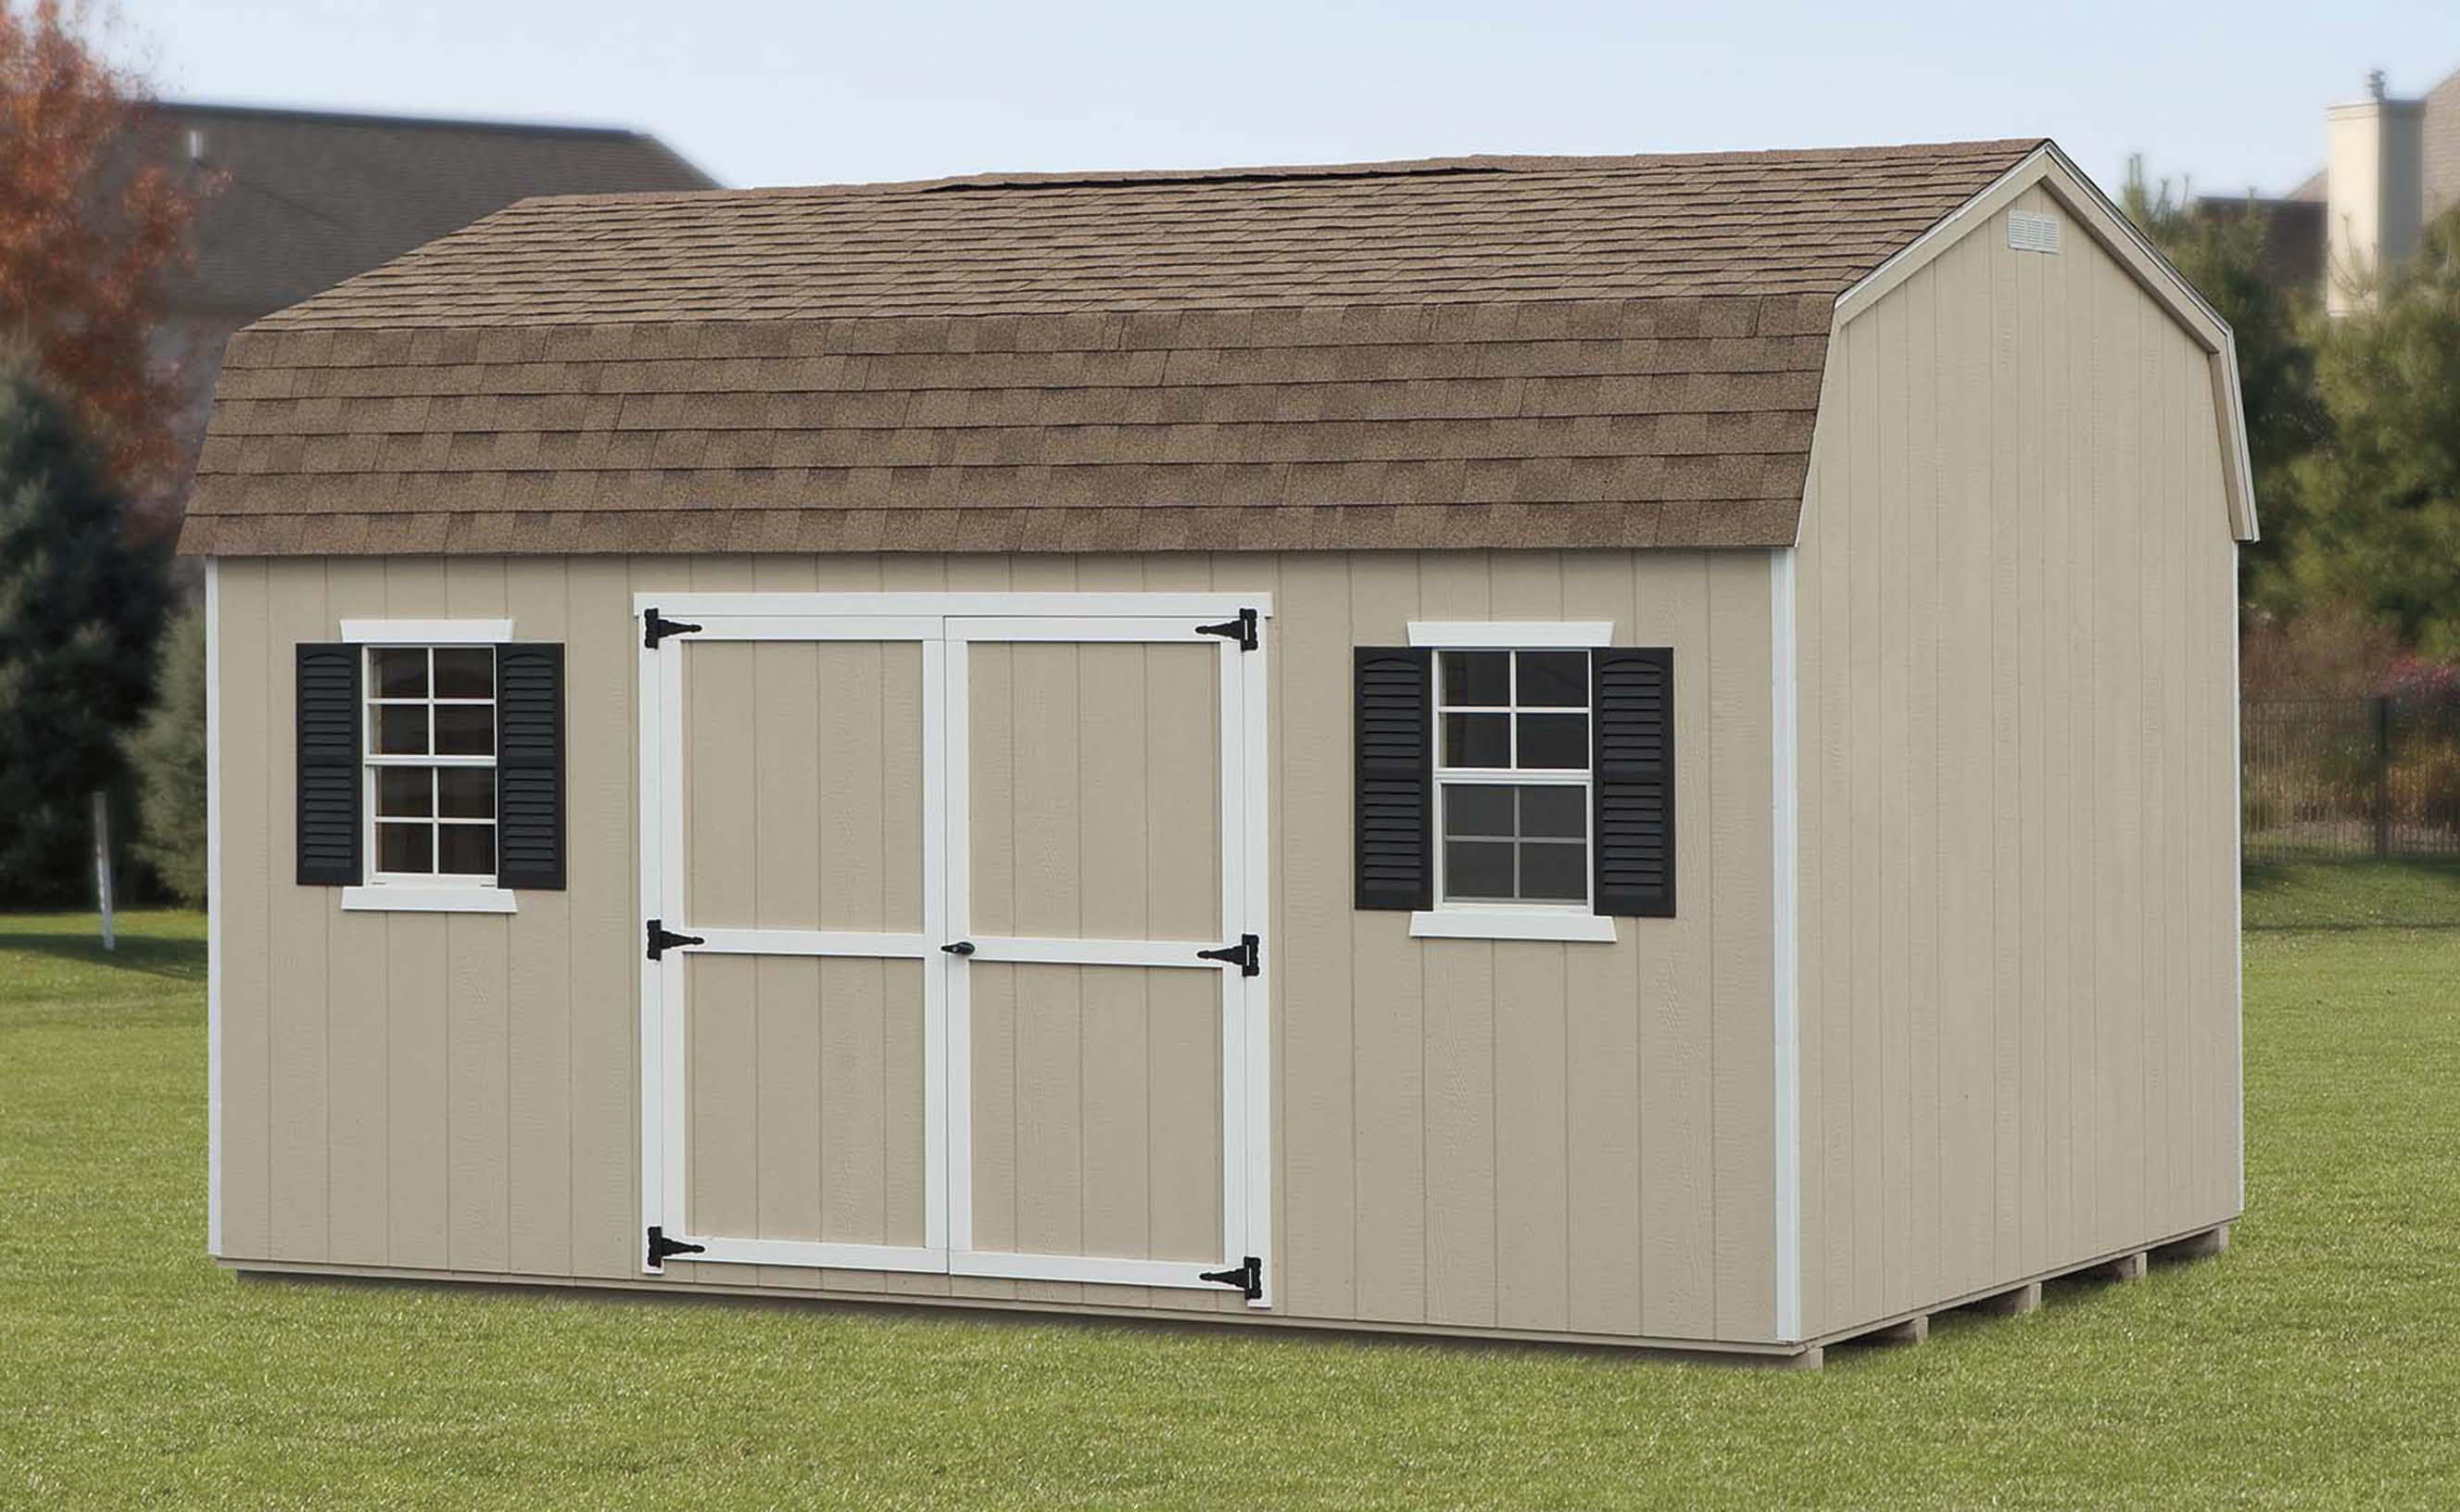 barn shed x barns storage built amish high youtube watch